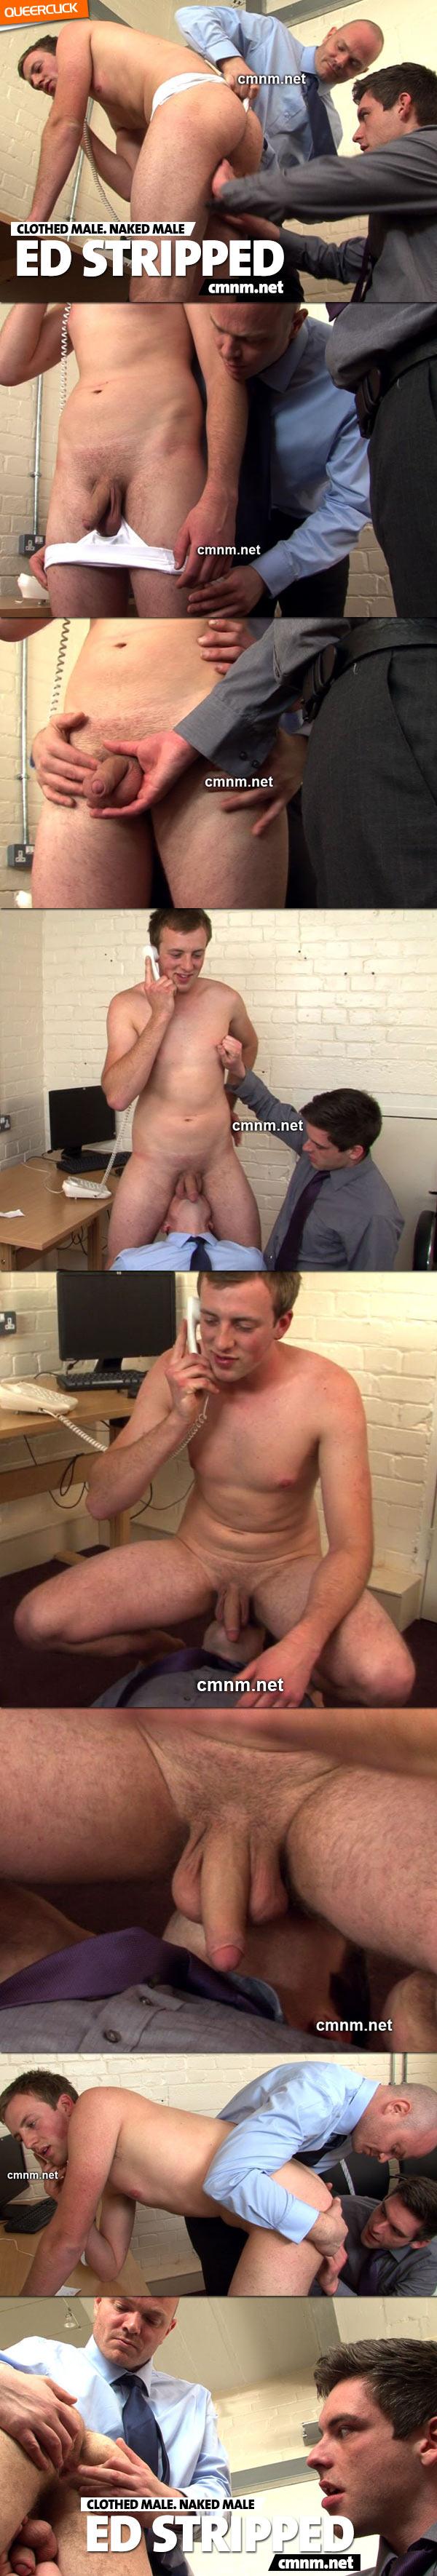 Hot shemale tranny porn free